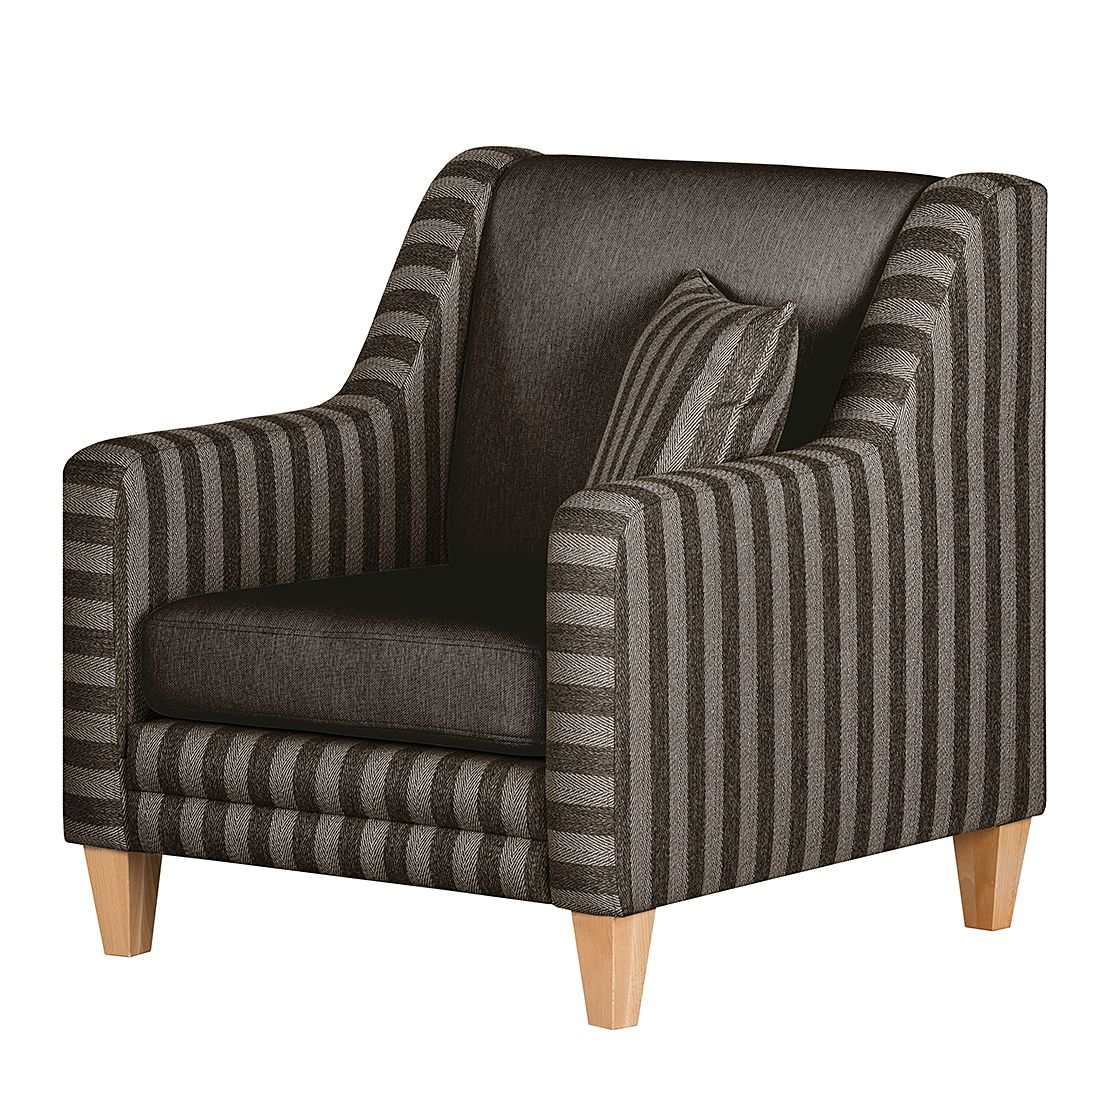 sessel kjell webstoff fischgr tmuster braun gestreift. Black Bedroom Furniture Sets. Home Design Ideas